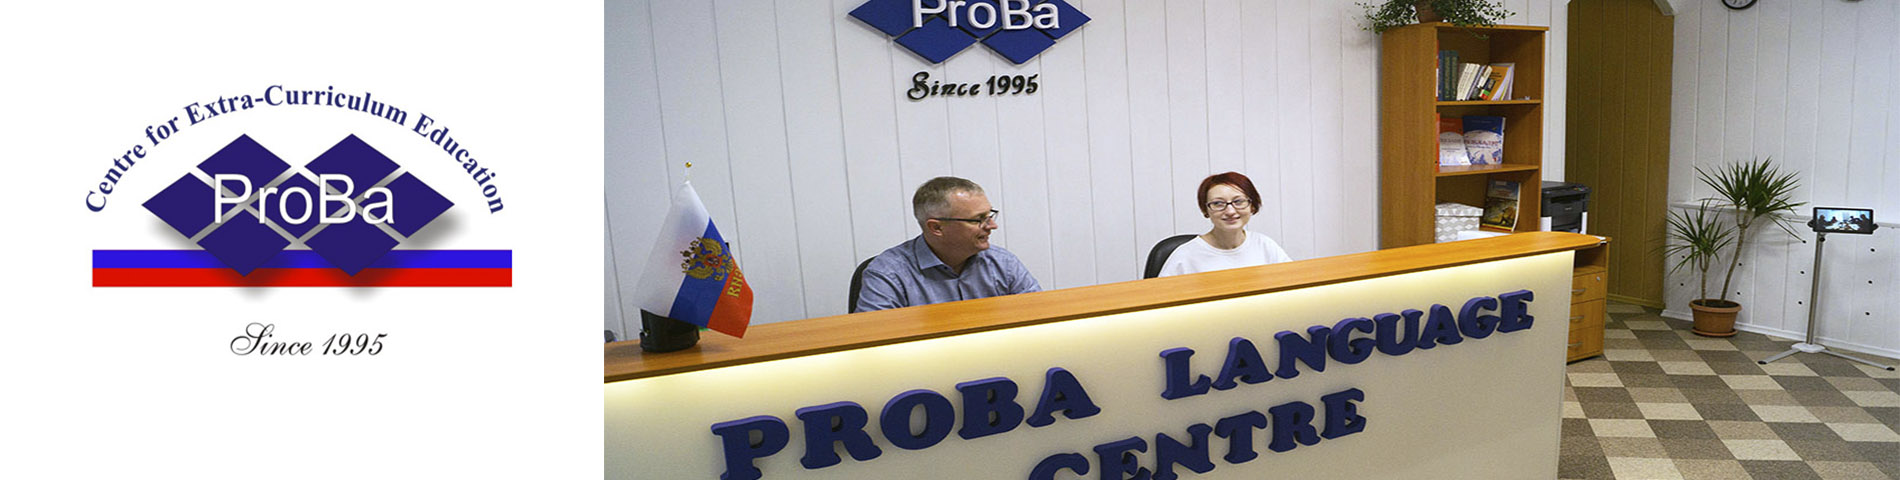 ProBa Language Centre banner